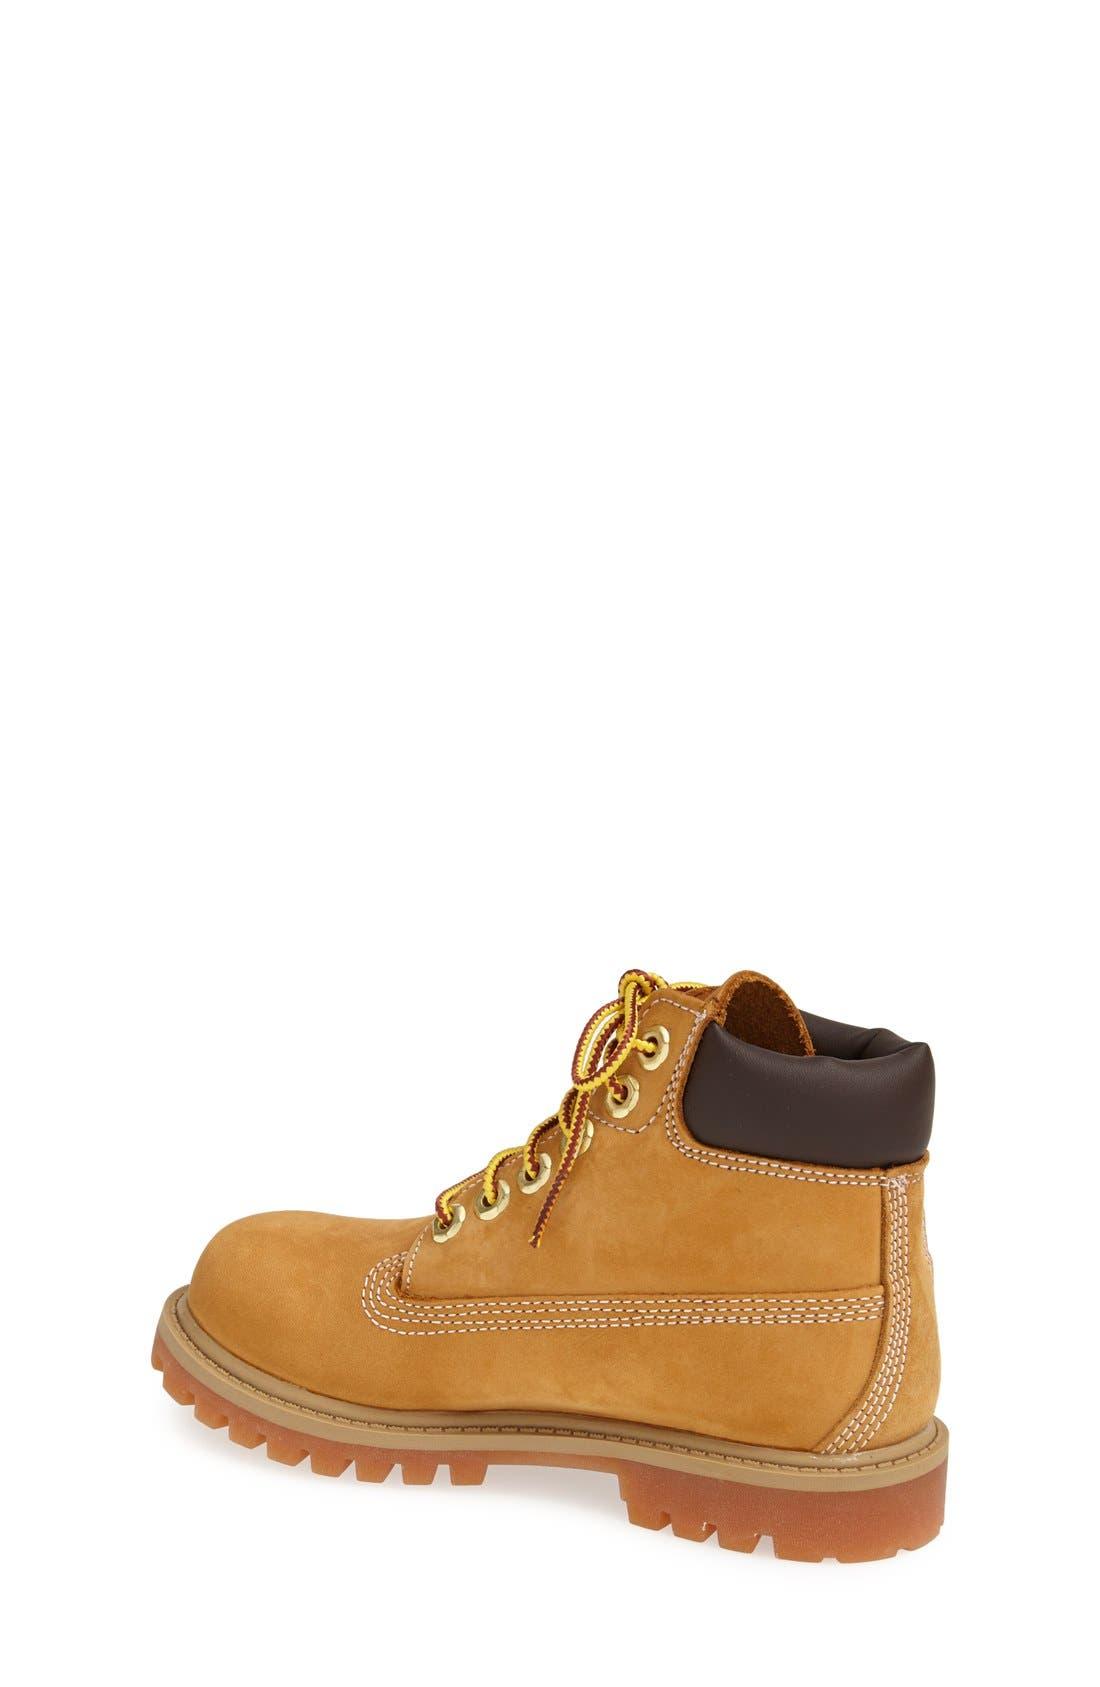 Alternate Image 2  - Timberland '6 Premium' Waterproof Leather Boot (Walker & Toddler)